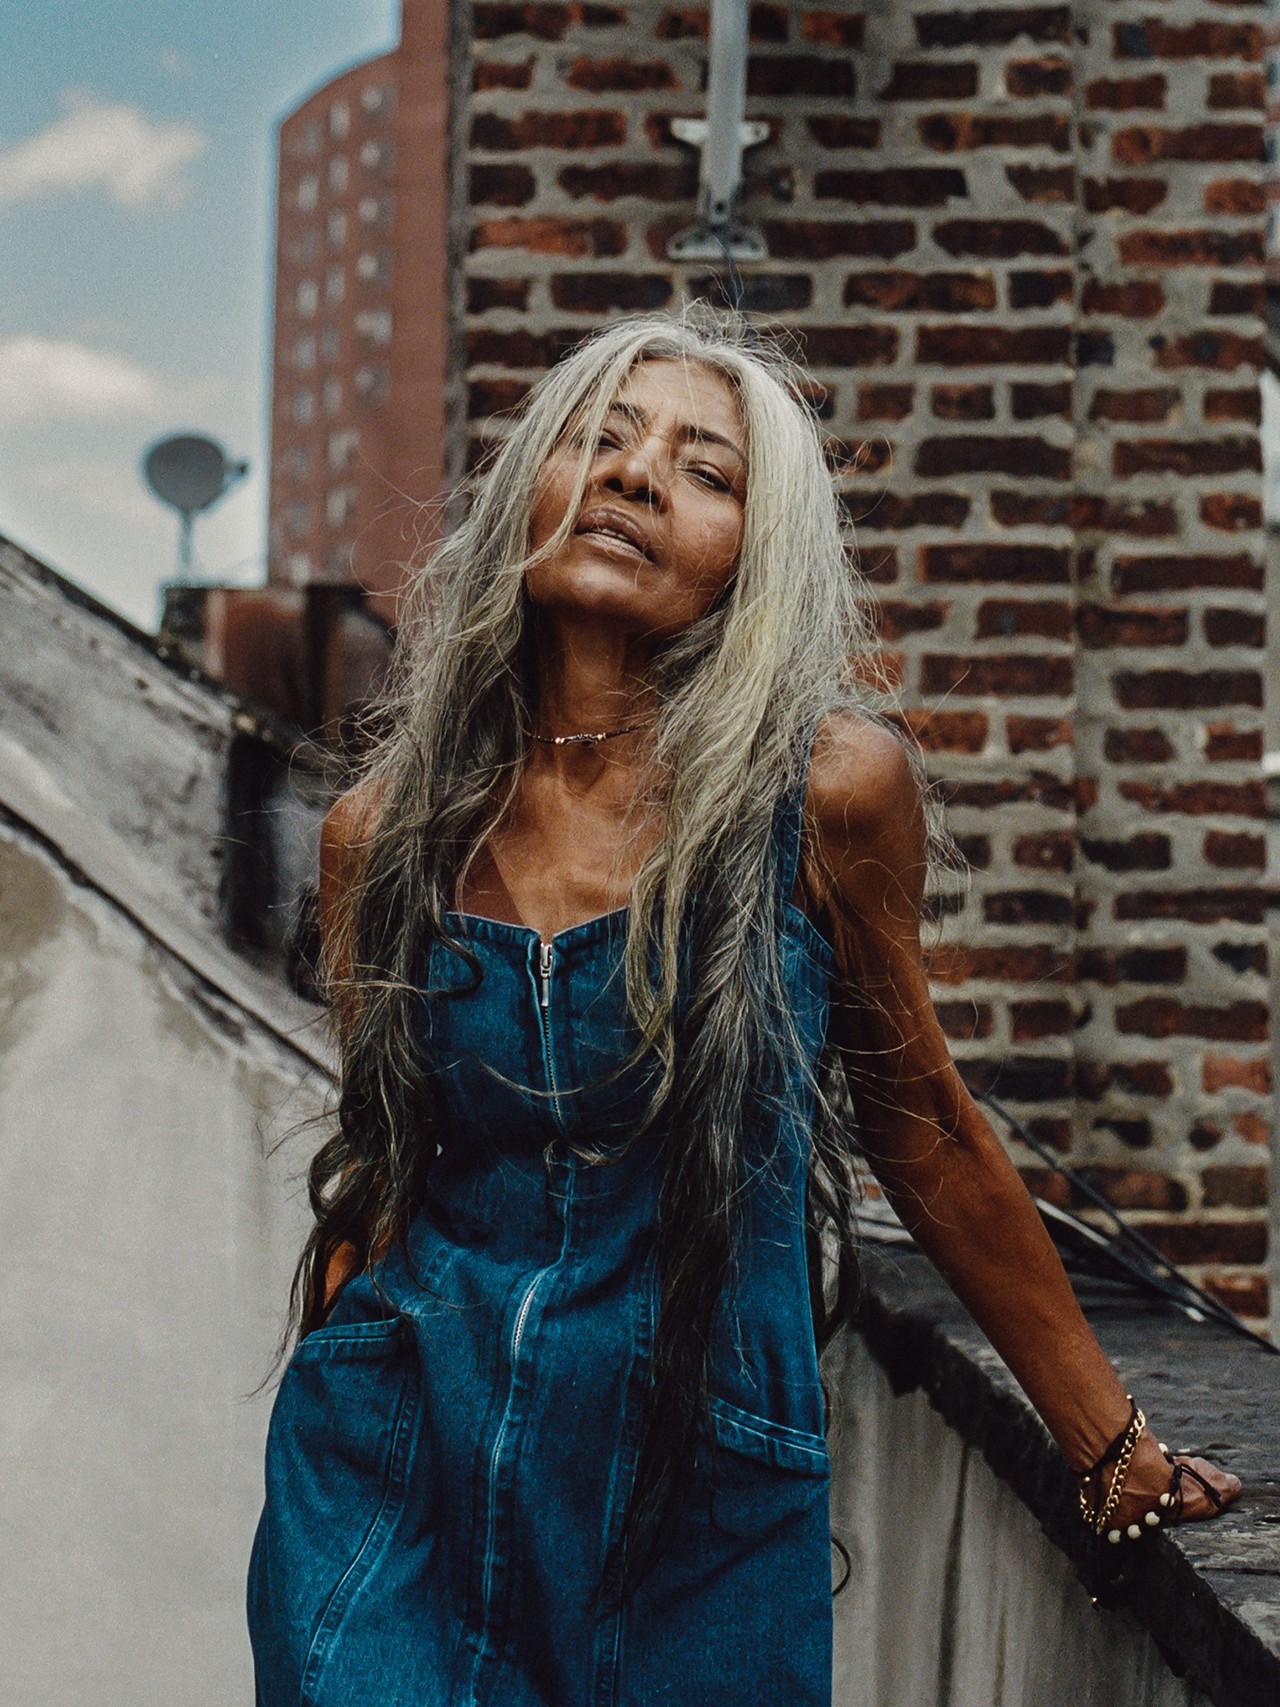 Conhece JoAni Jonhson, a modelo com 67 anos